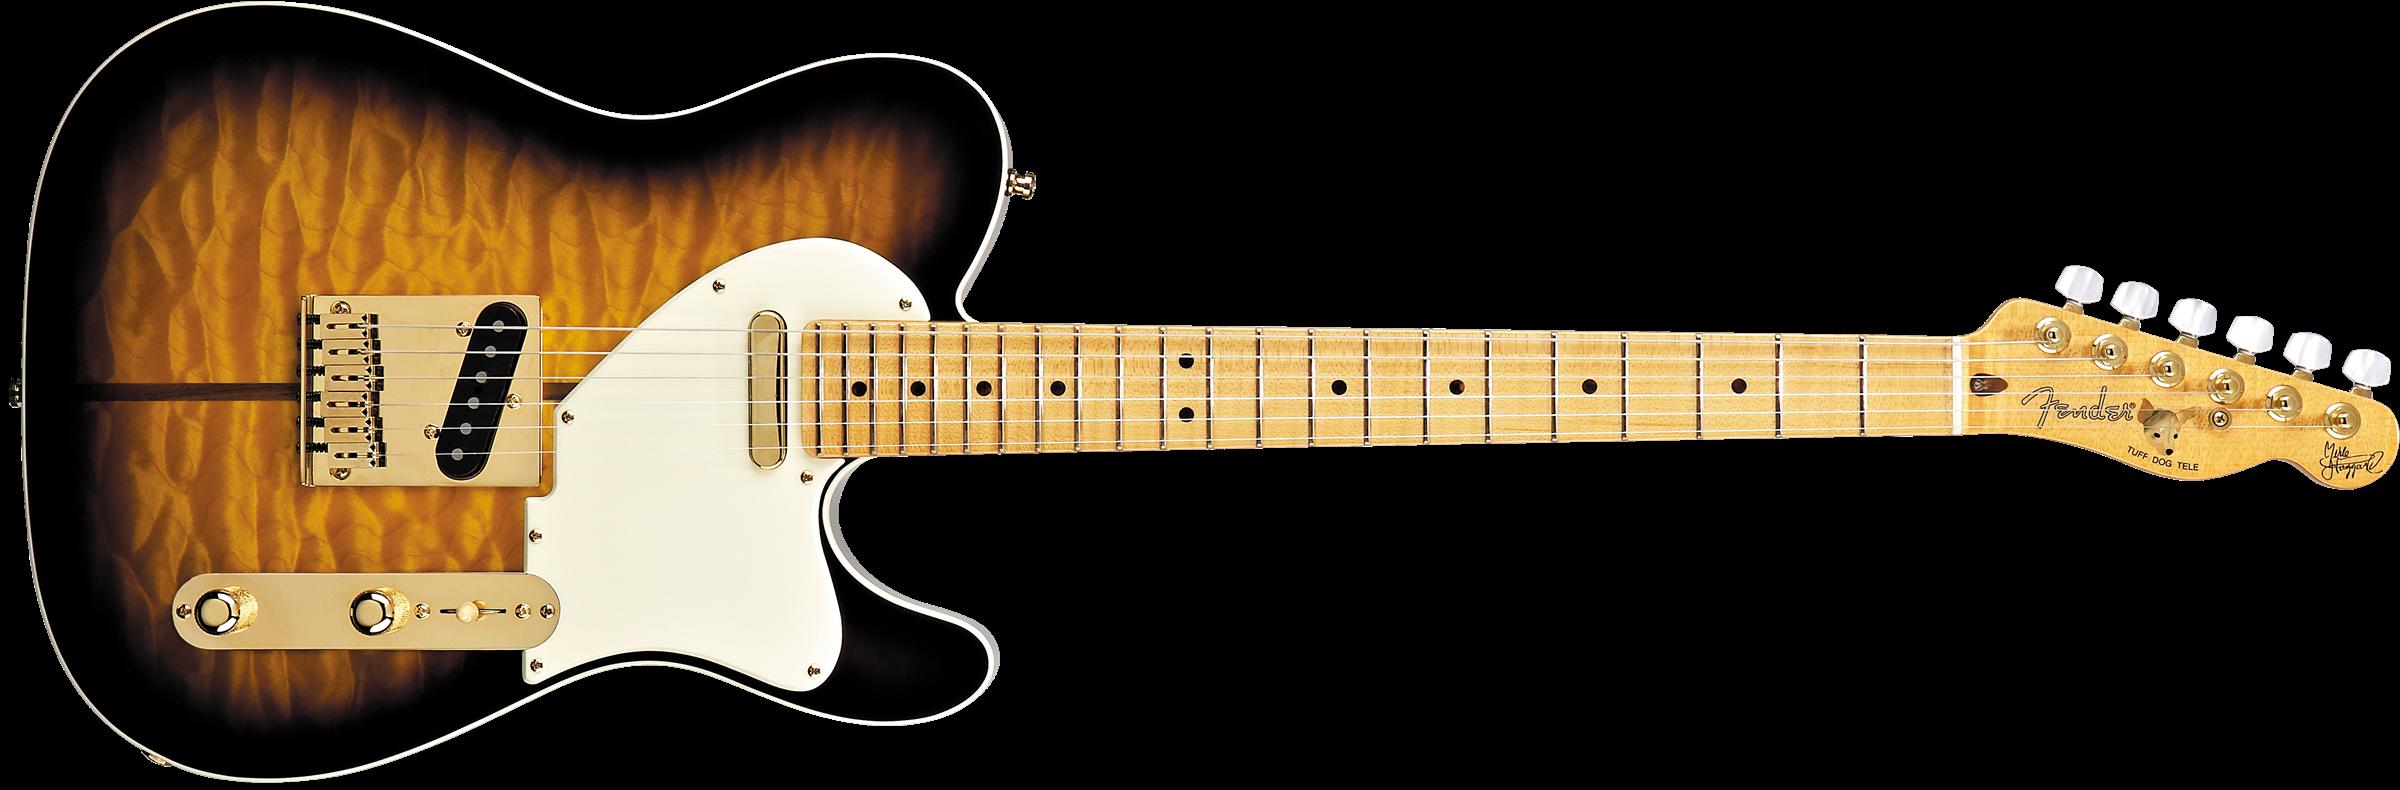 Merle Haggard Signature Telecaster®   Artist Series   Fender ...